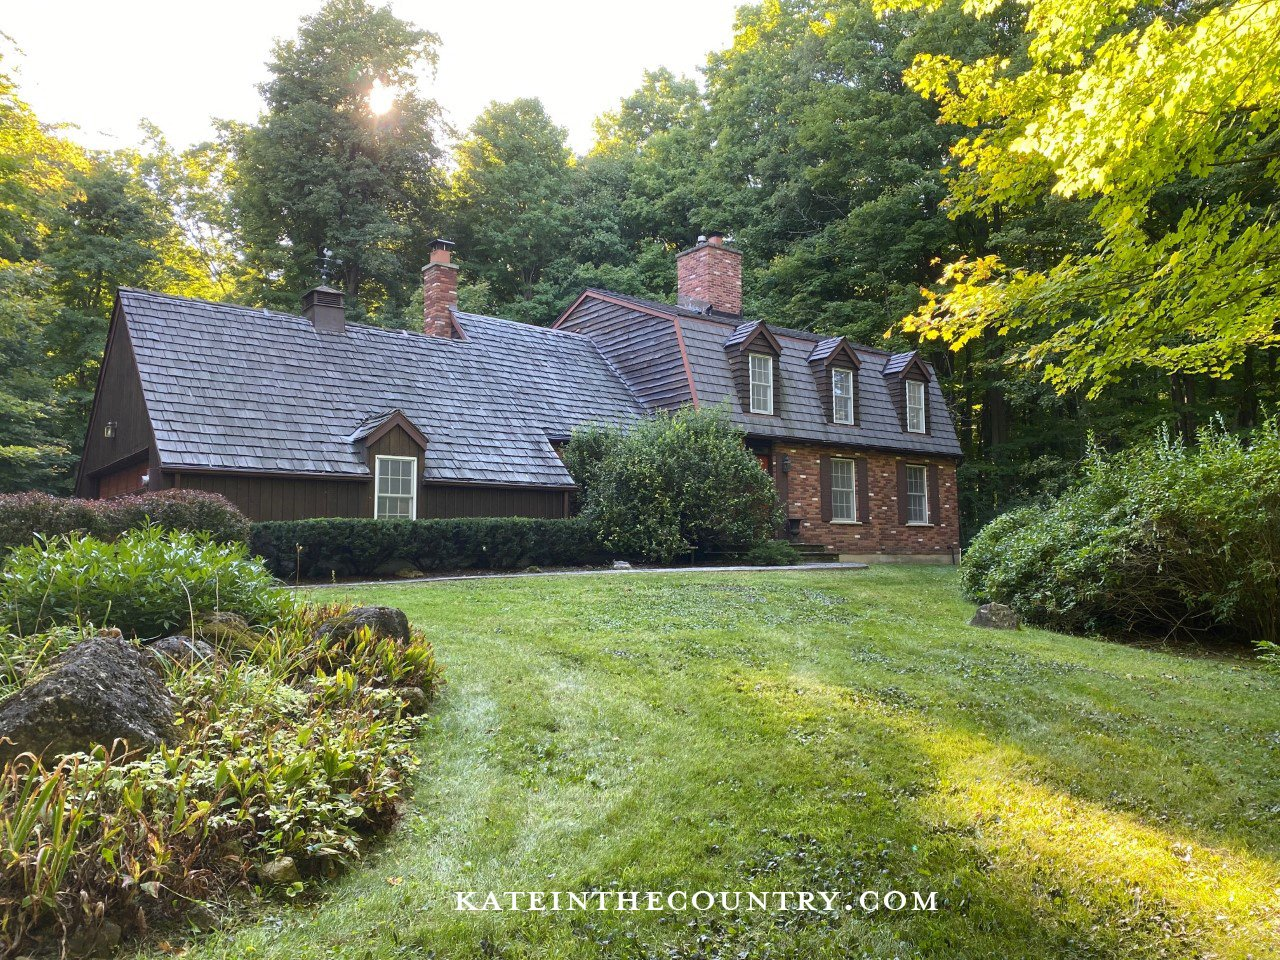 Home exterior - front, kateinthecountry.com